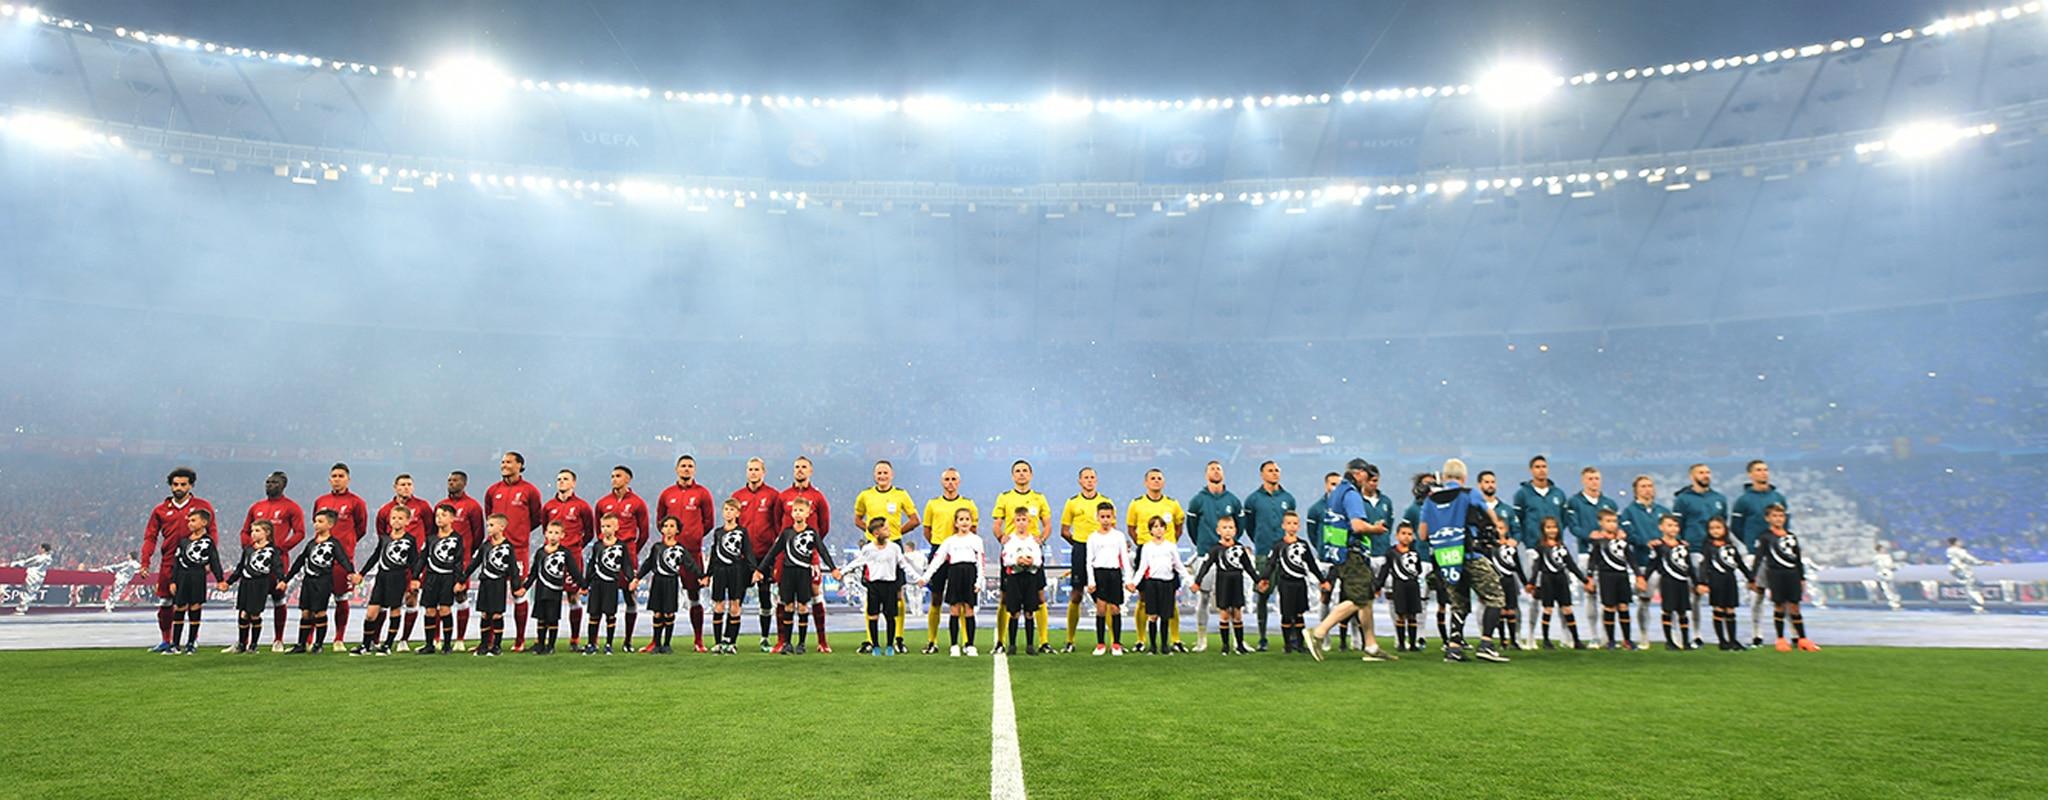 dynamo kyiv barcelona uefa champions league uefa com dynamo kyiv barcelona uefa champions